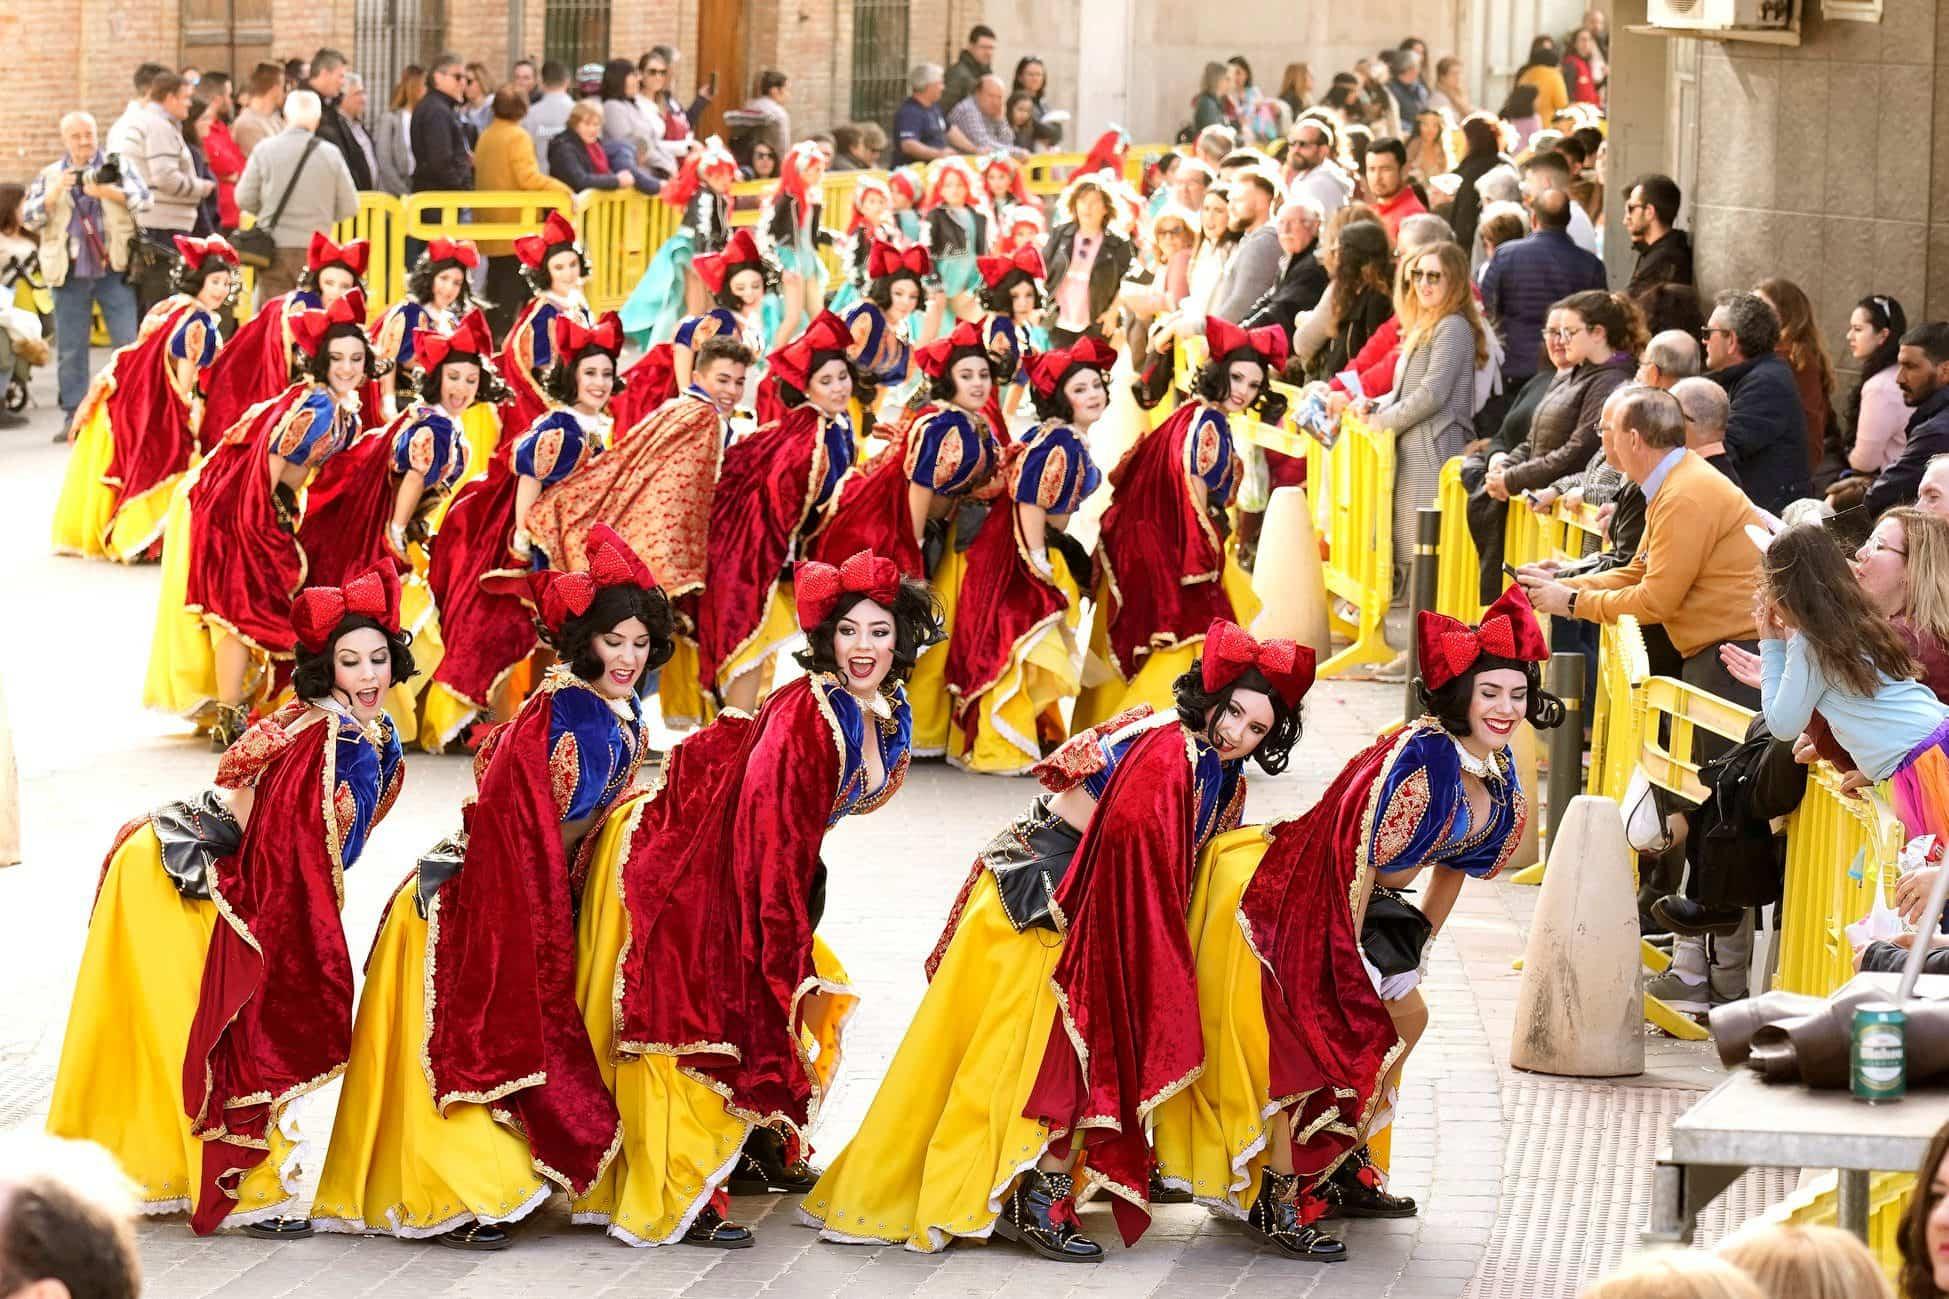 Carnaval de herencia 2020 ofertorio 12 - Selección de fotografías del Ofertorio del Carnaval de Herencia